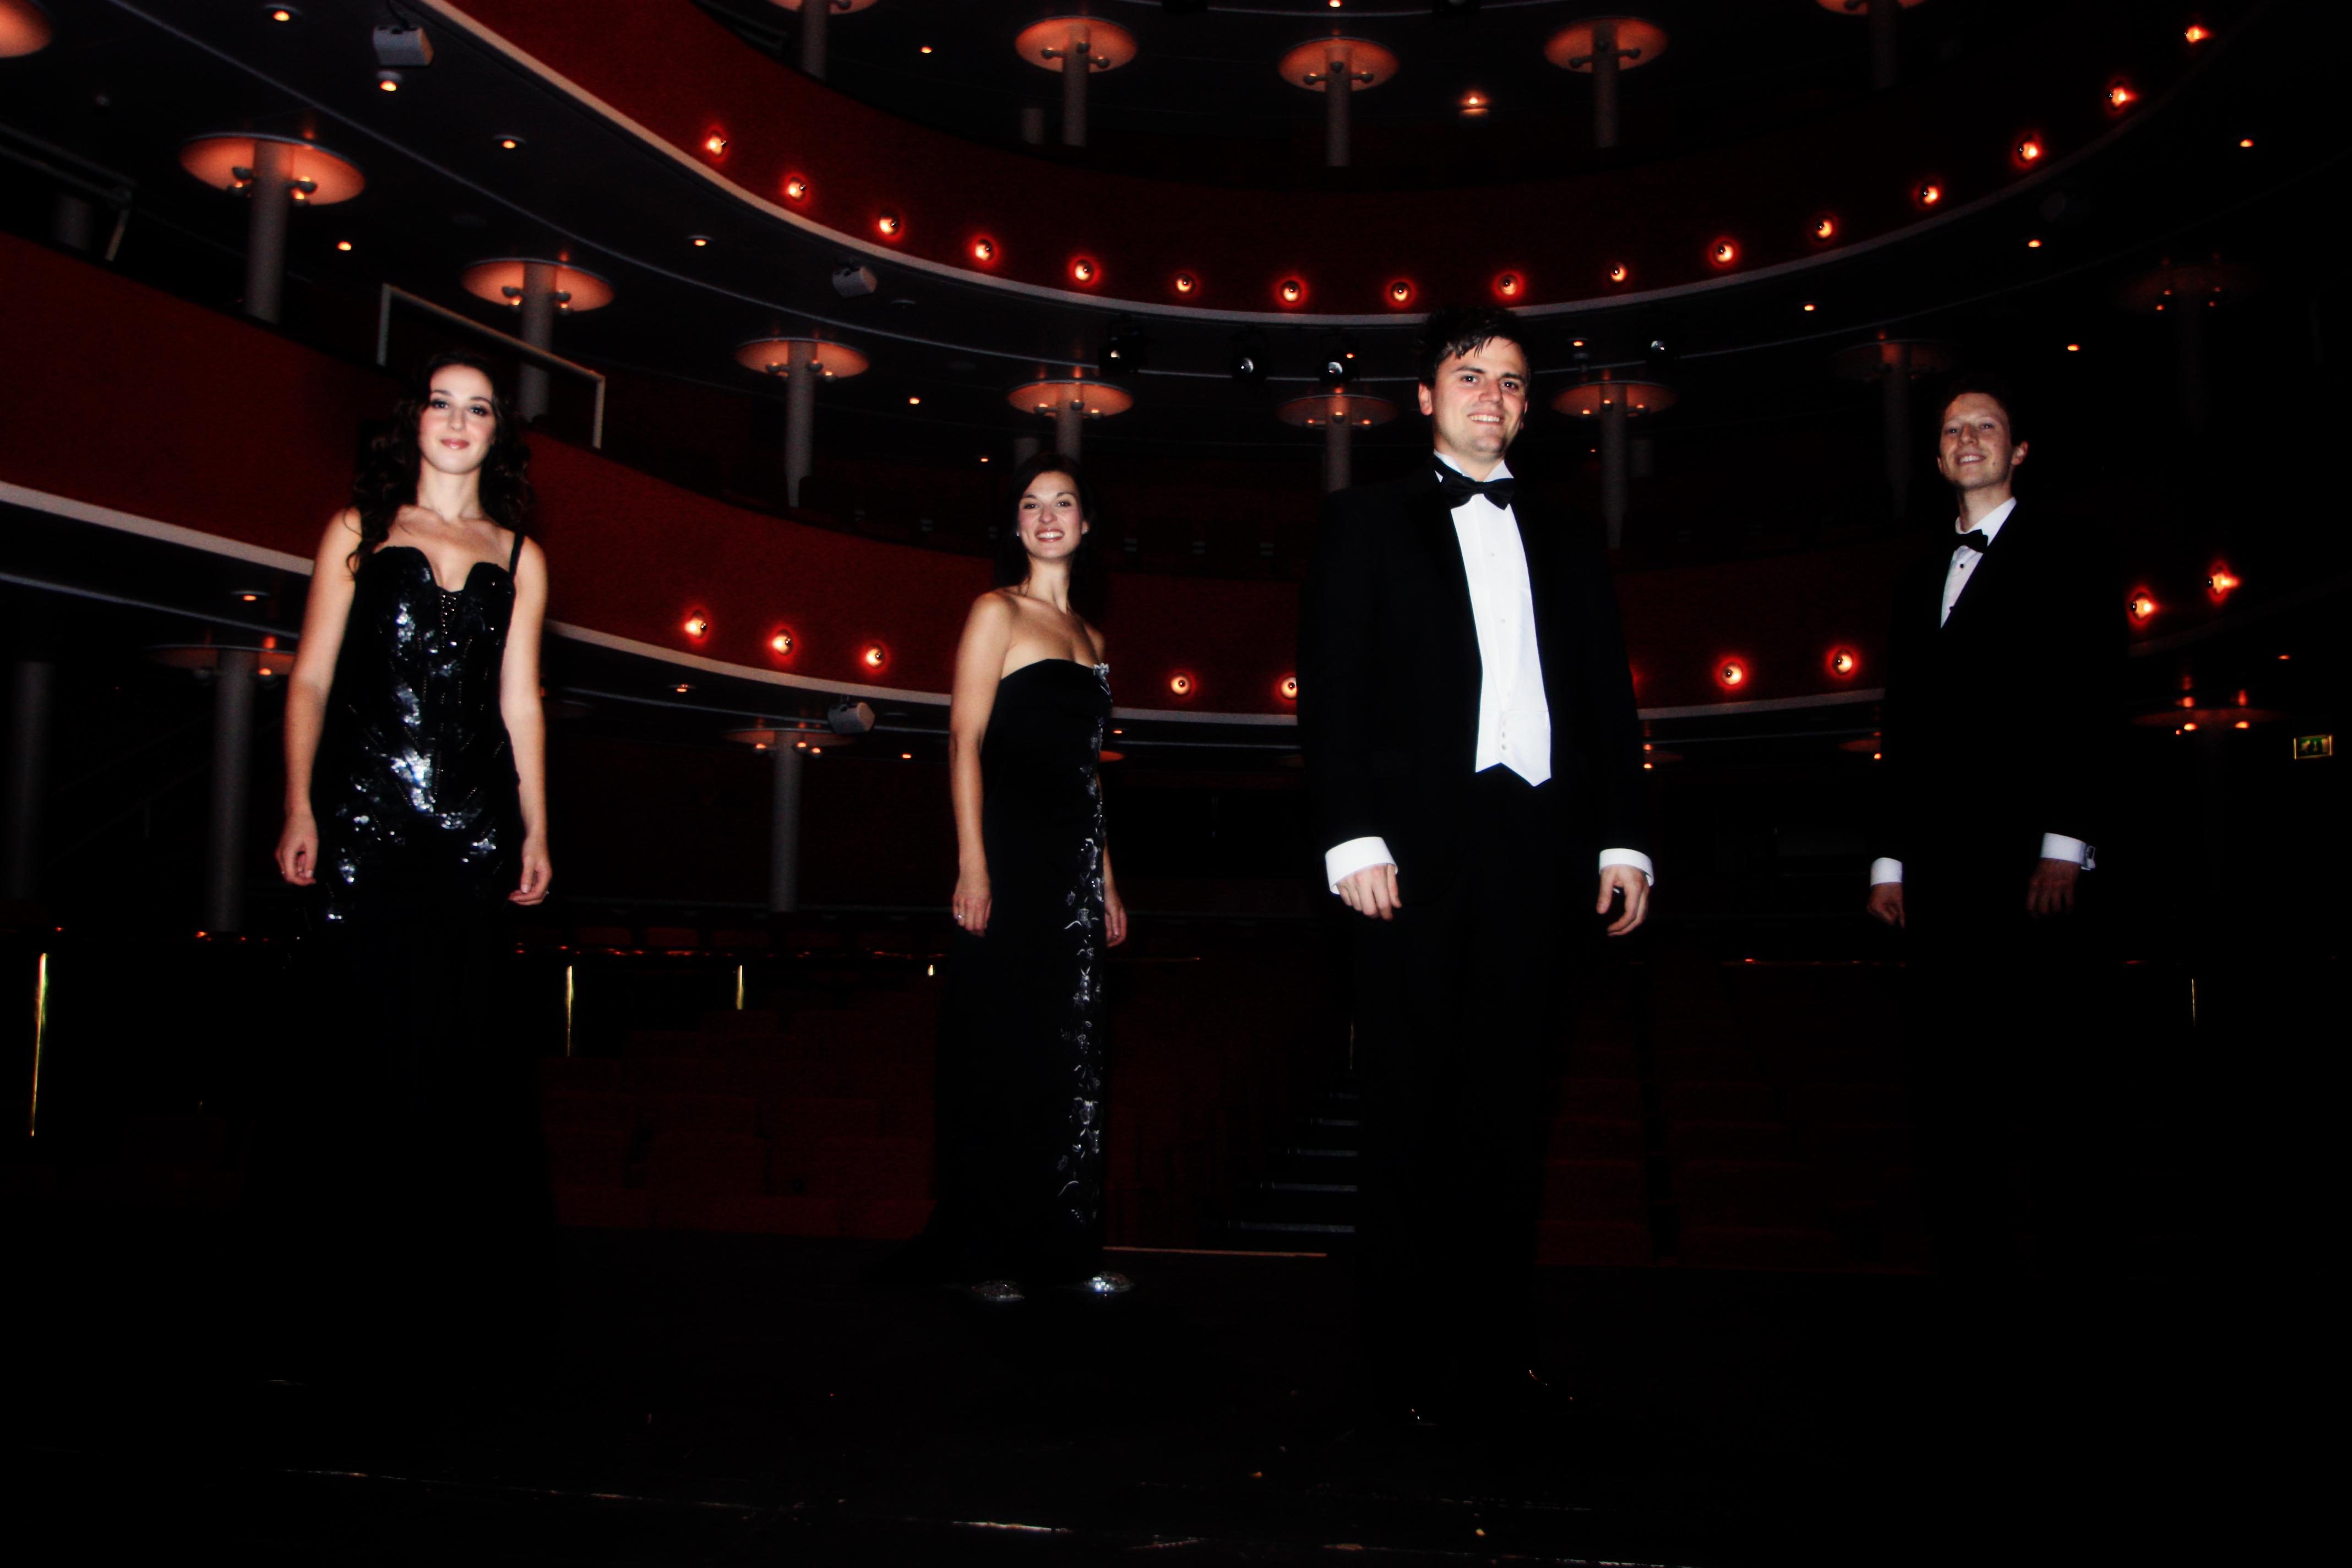 Opera Gala · 4uartet & Marc Verter